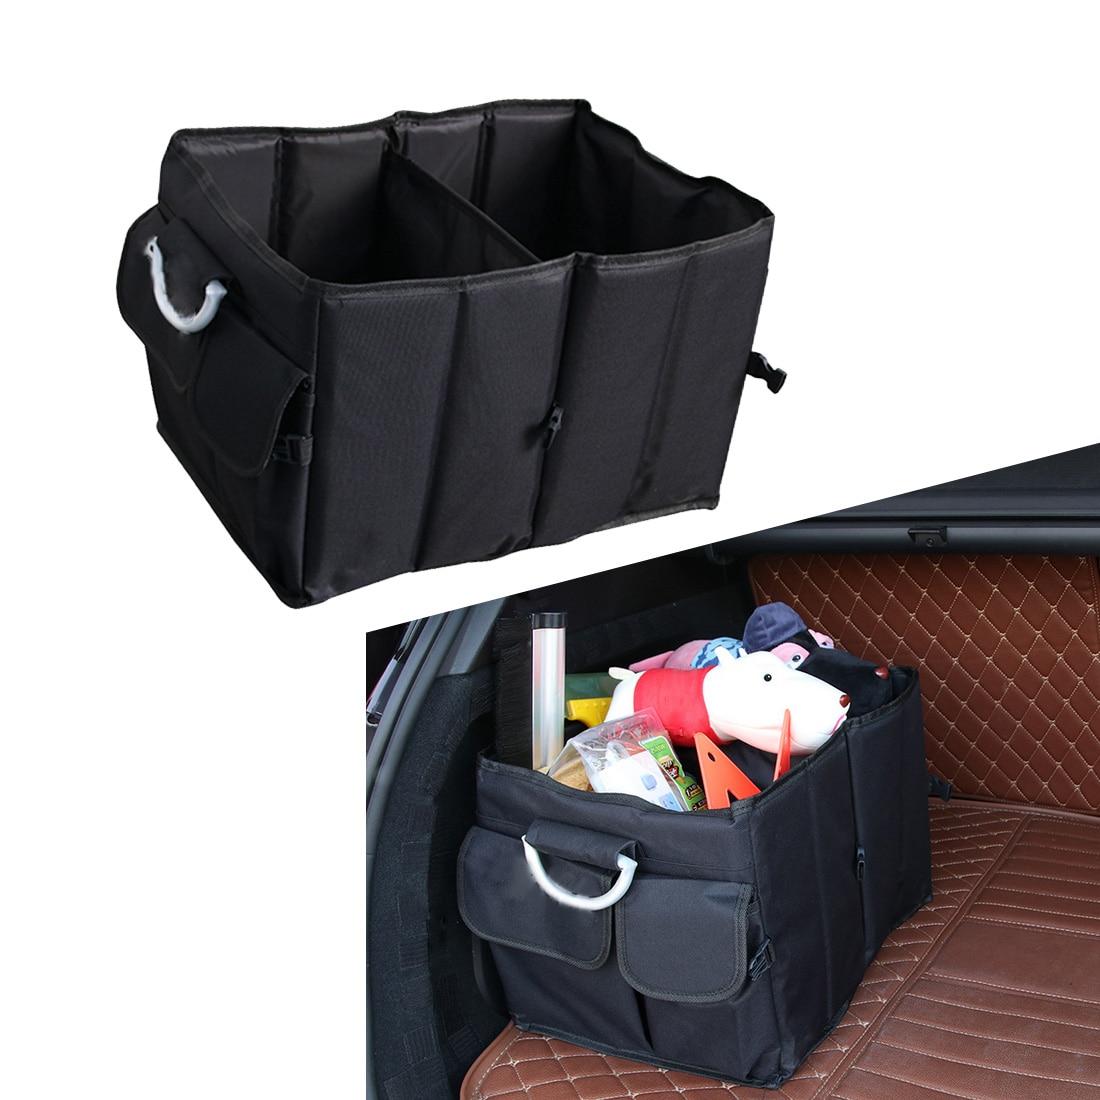 Disney Collapsible Storage Trunk Toy Box Organizer Chest: Dongzhen 1X Car Storage Box Trunk Organizer Toys Food